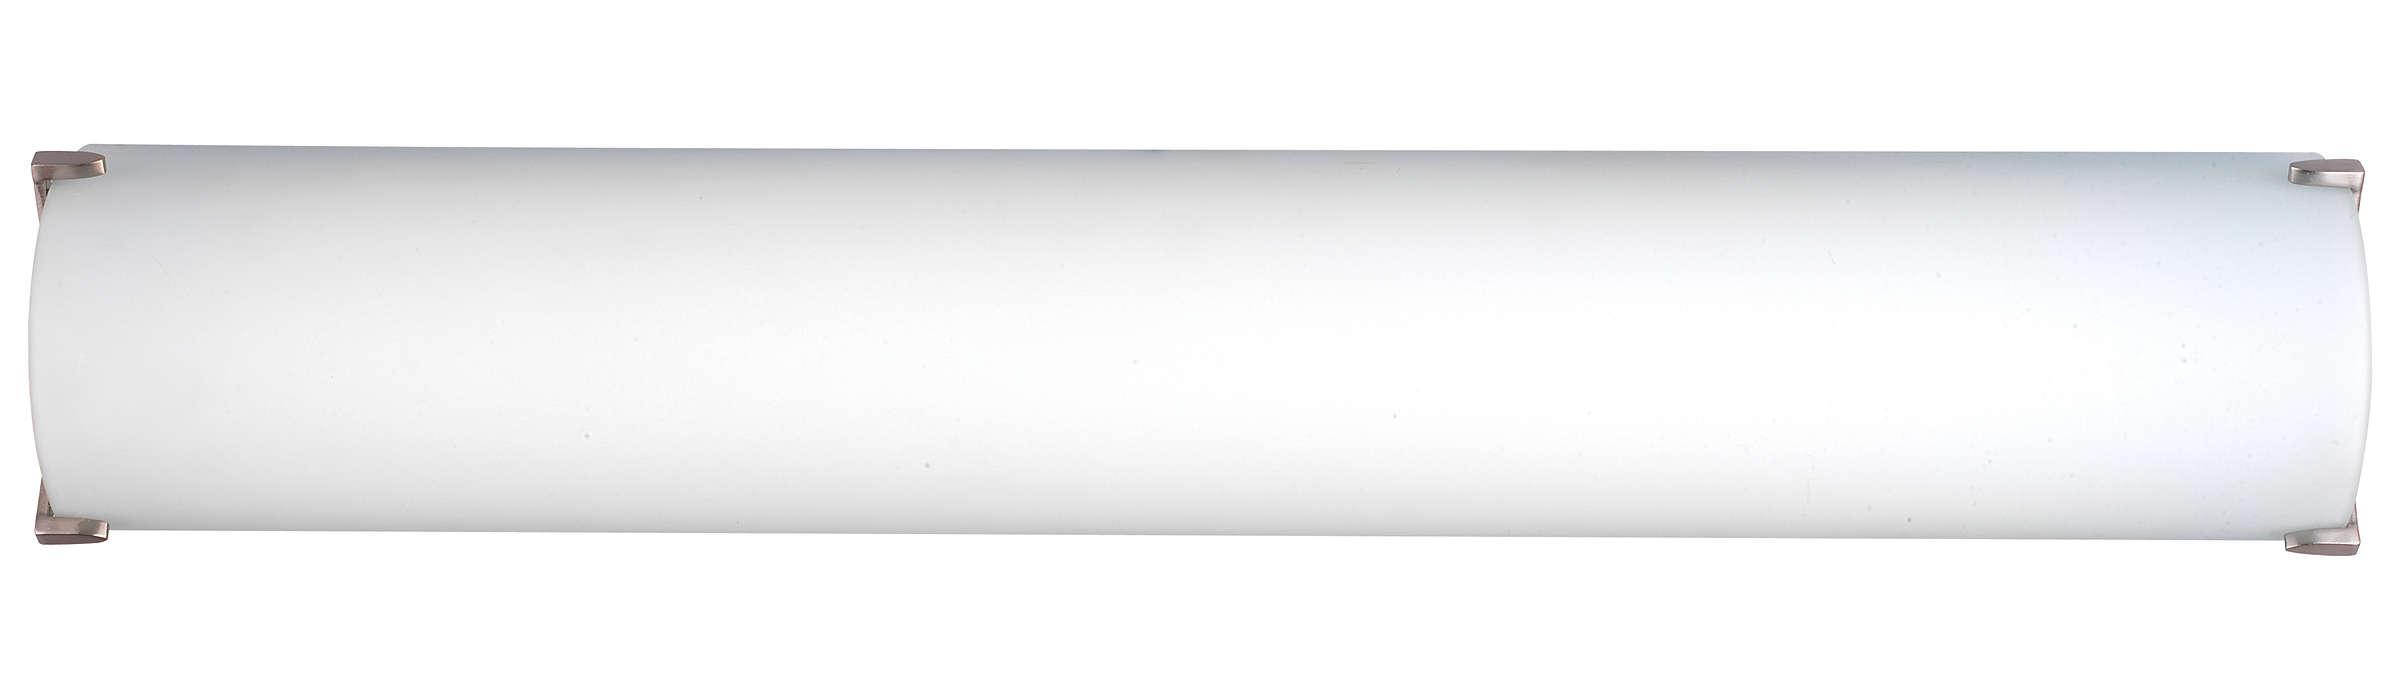 Edge 2-light Bath in Satin Nickel finish